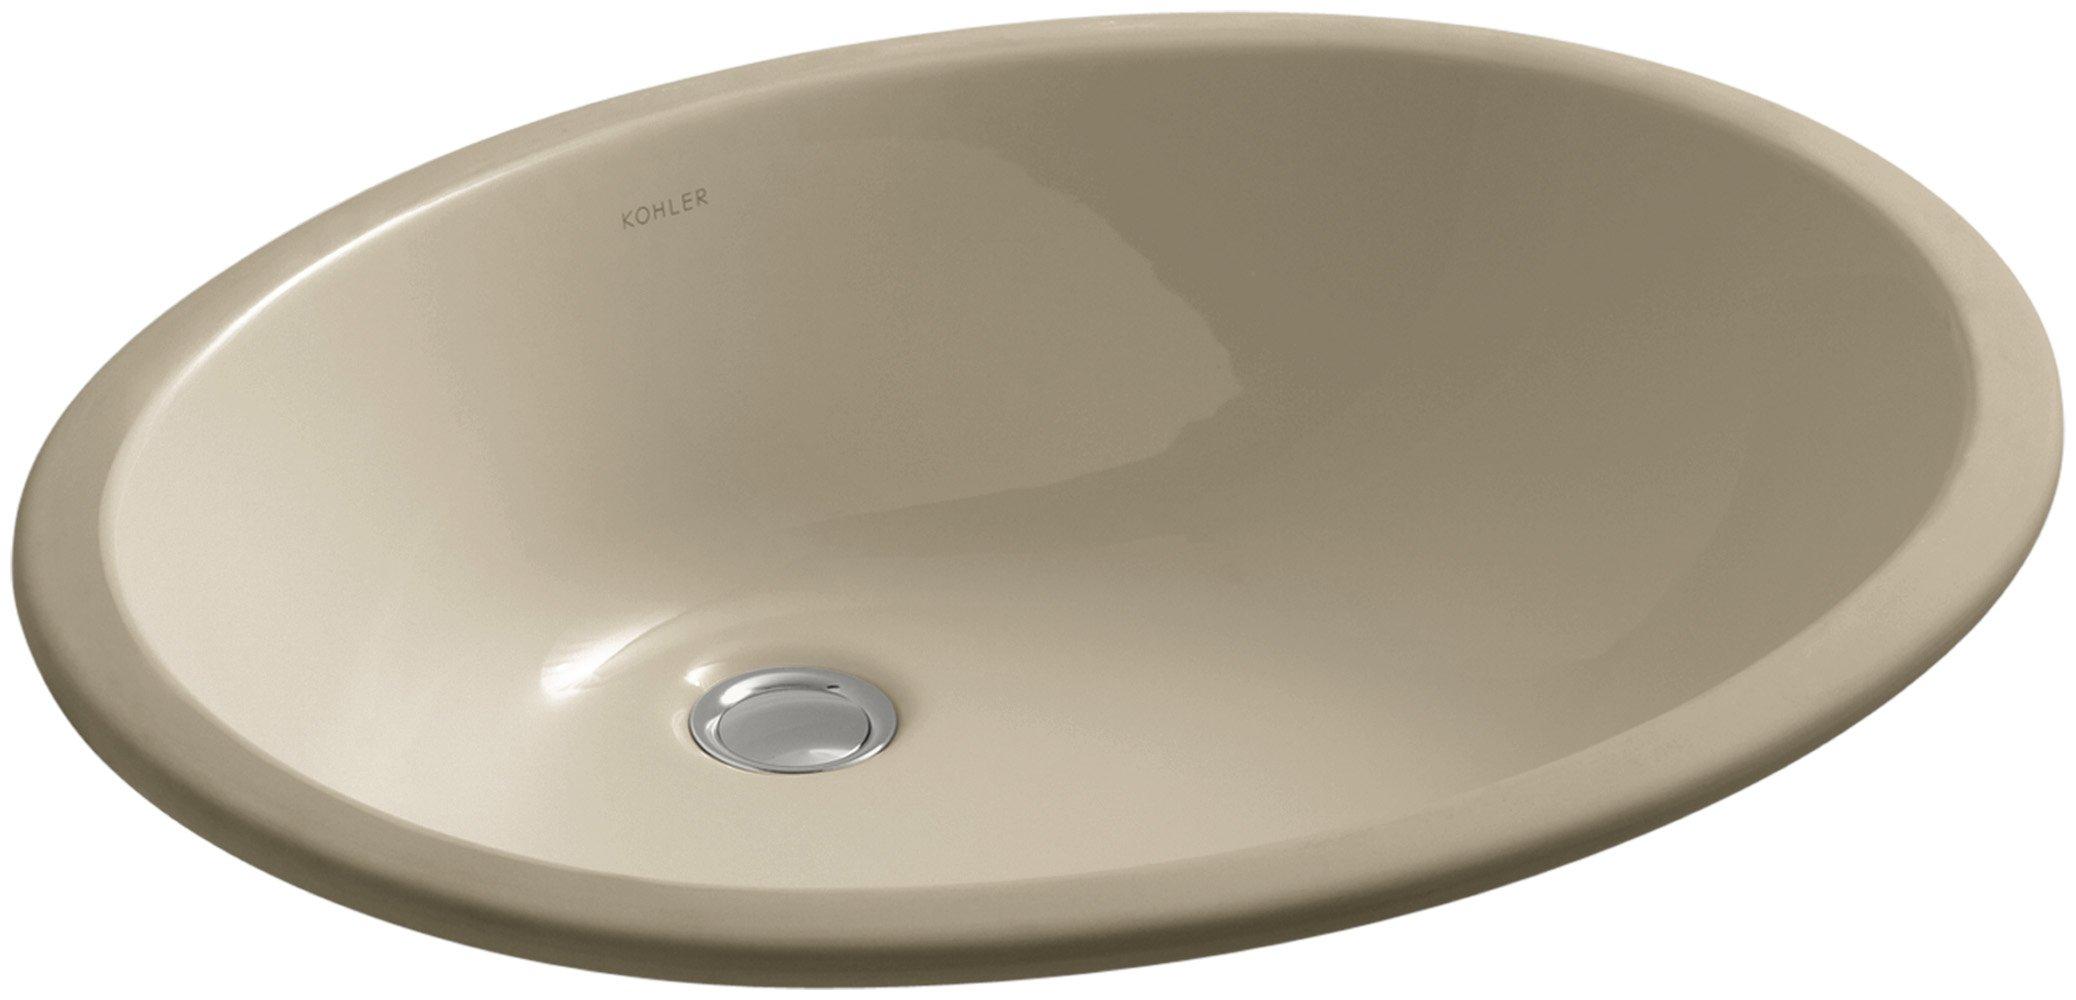 KOHLER K-2211-33 Caxton Undercounter Bathroom Sink, Mexican Sand